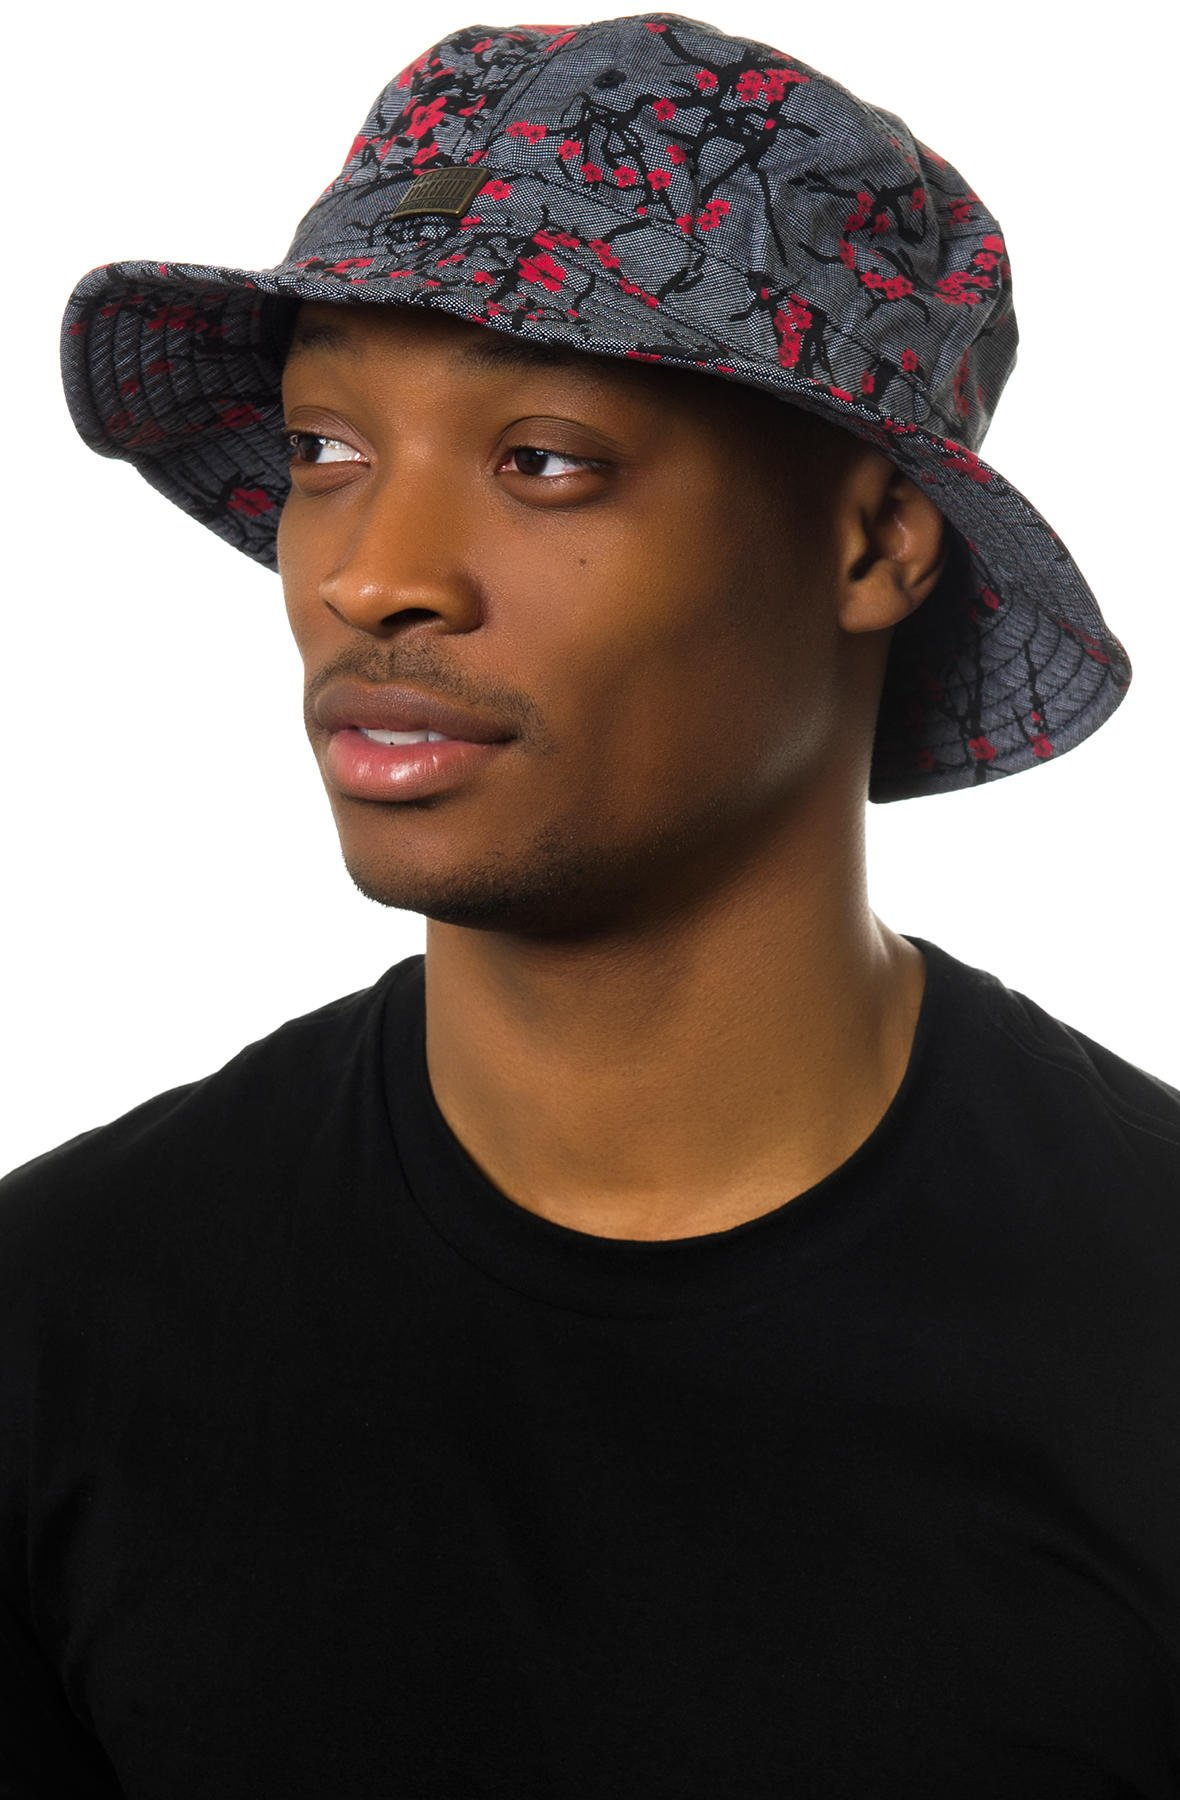 Floralby Creative Japanese Print Bucket Hat Men Women Foldable Sun Hat Outdoor Cap UV Protection